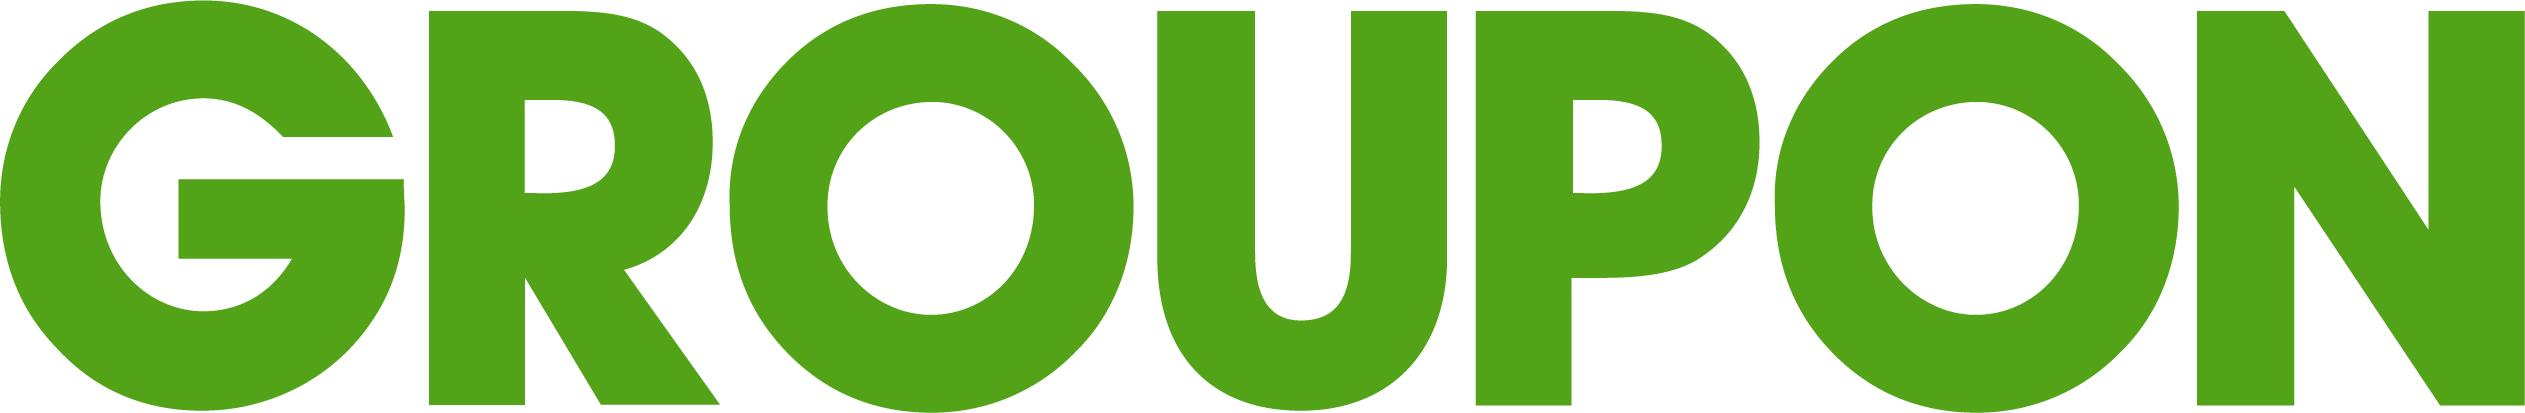 Groupon UK Reviews | Read Customer Service Reviews of